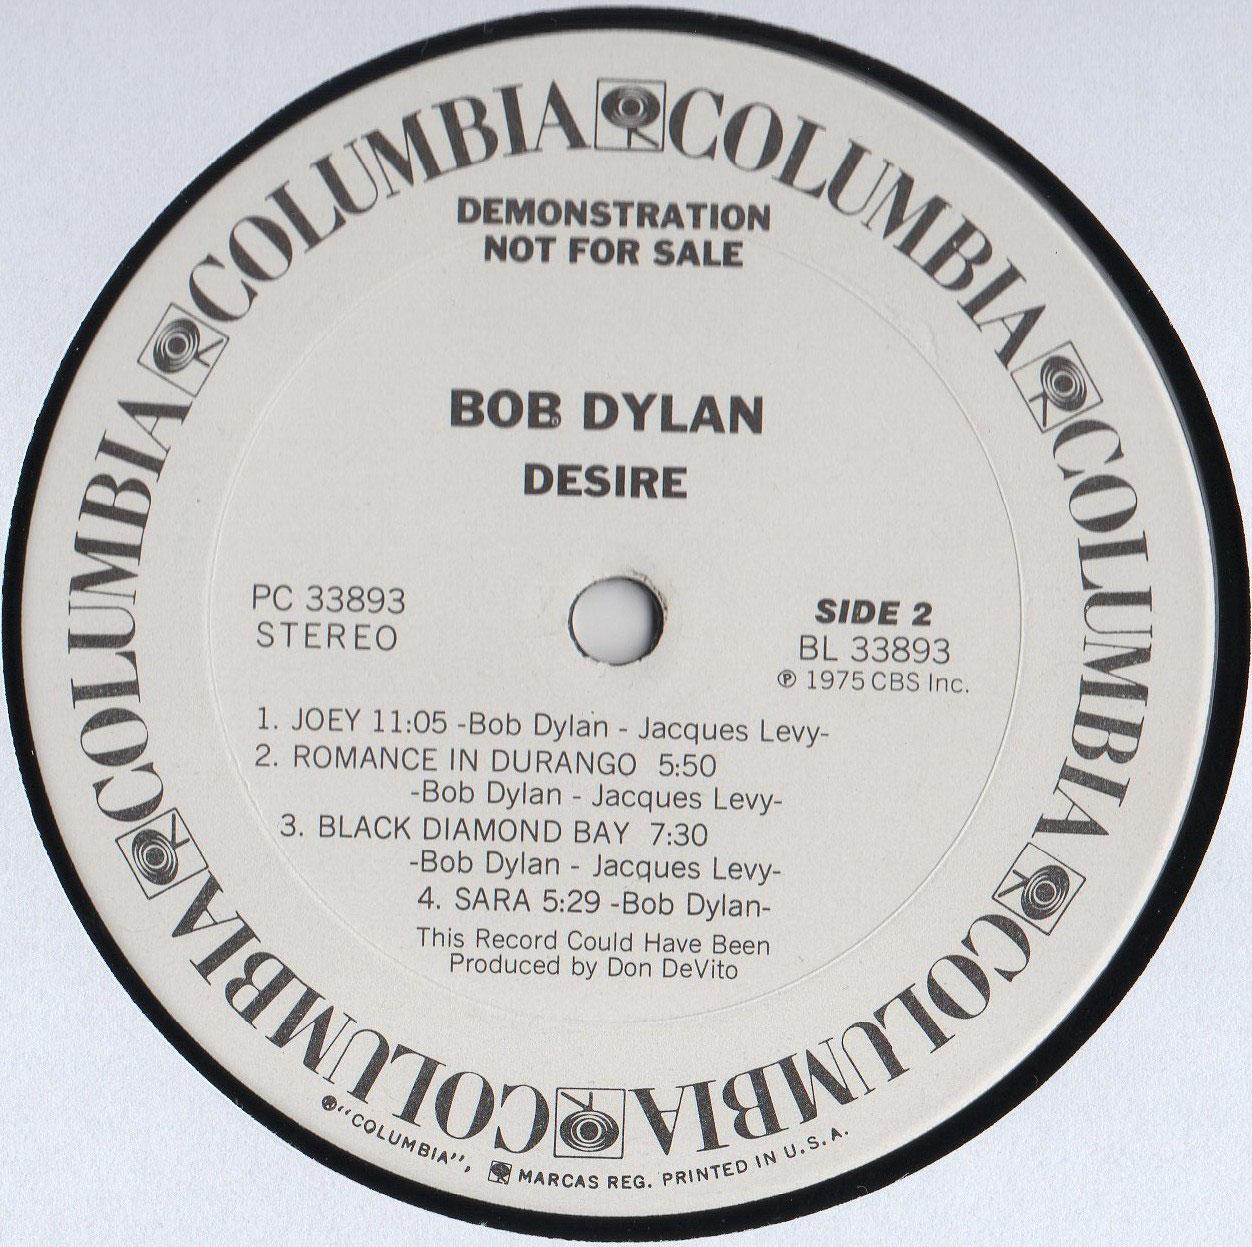 Bob Dylan - analogalbumss Webseite!